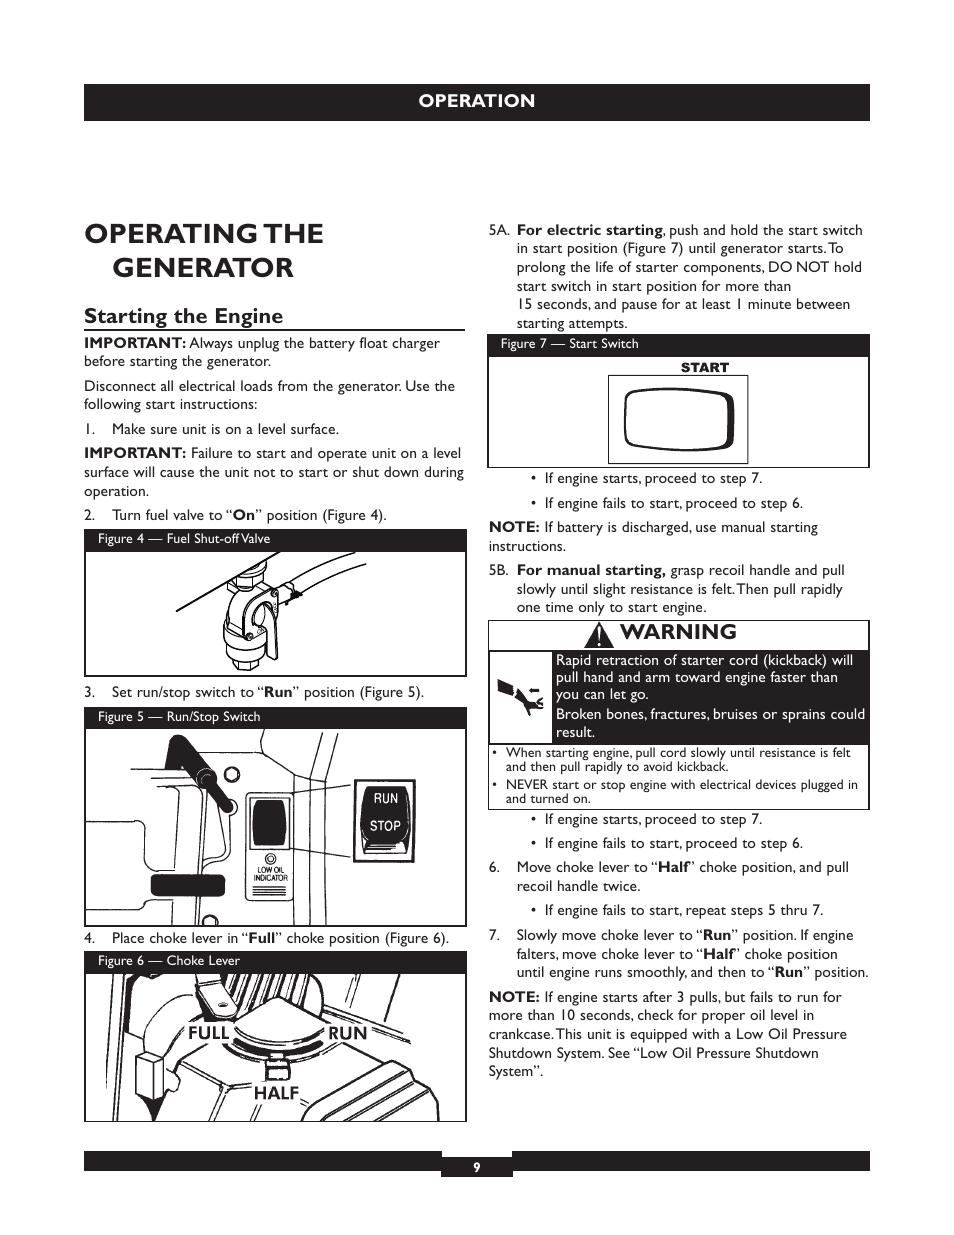 Operating the generator, Starting the engine, Warning